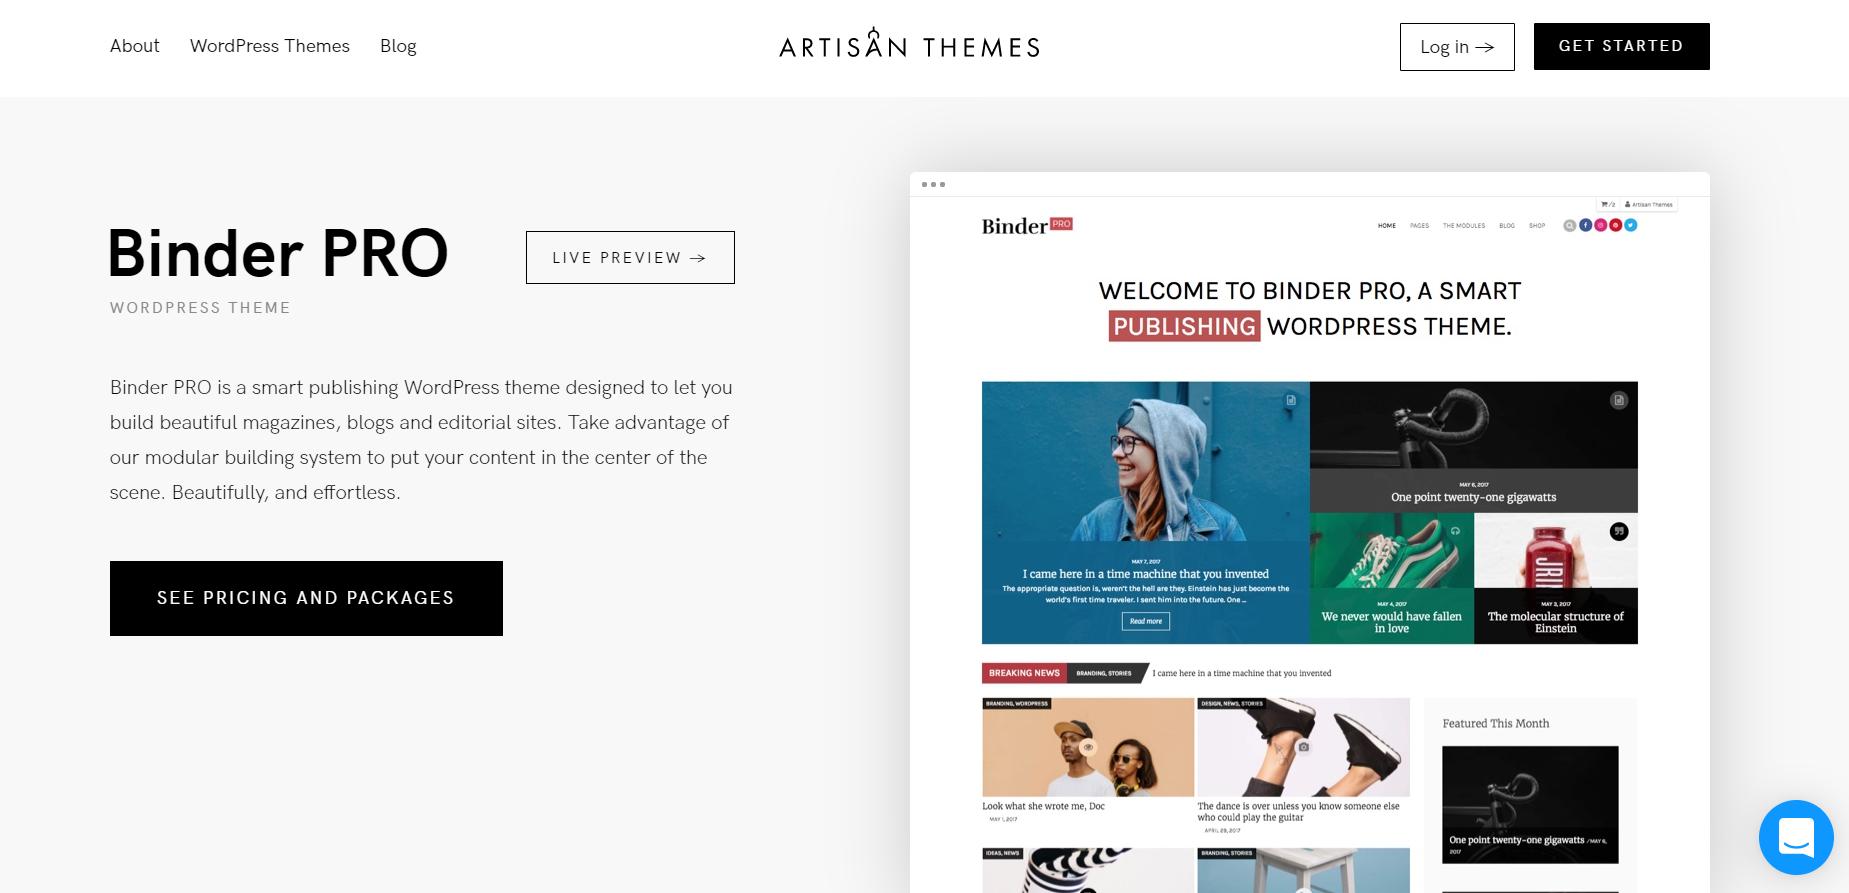 binder pro wordpress theme